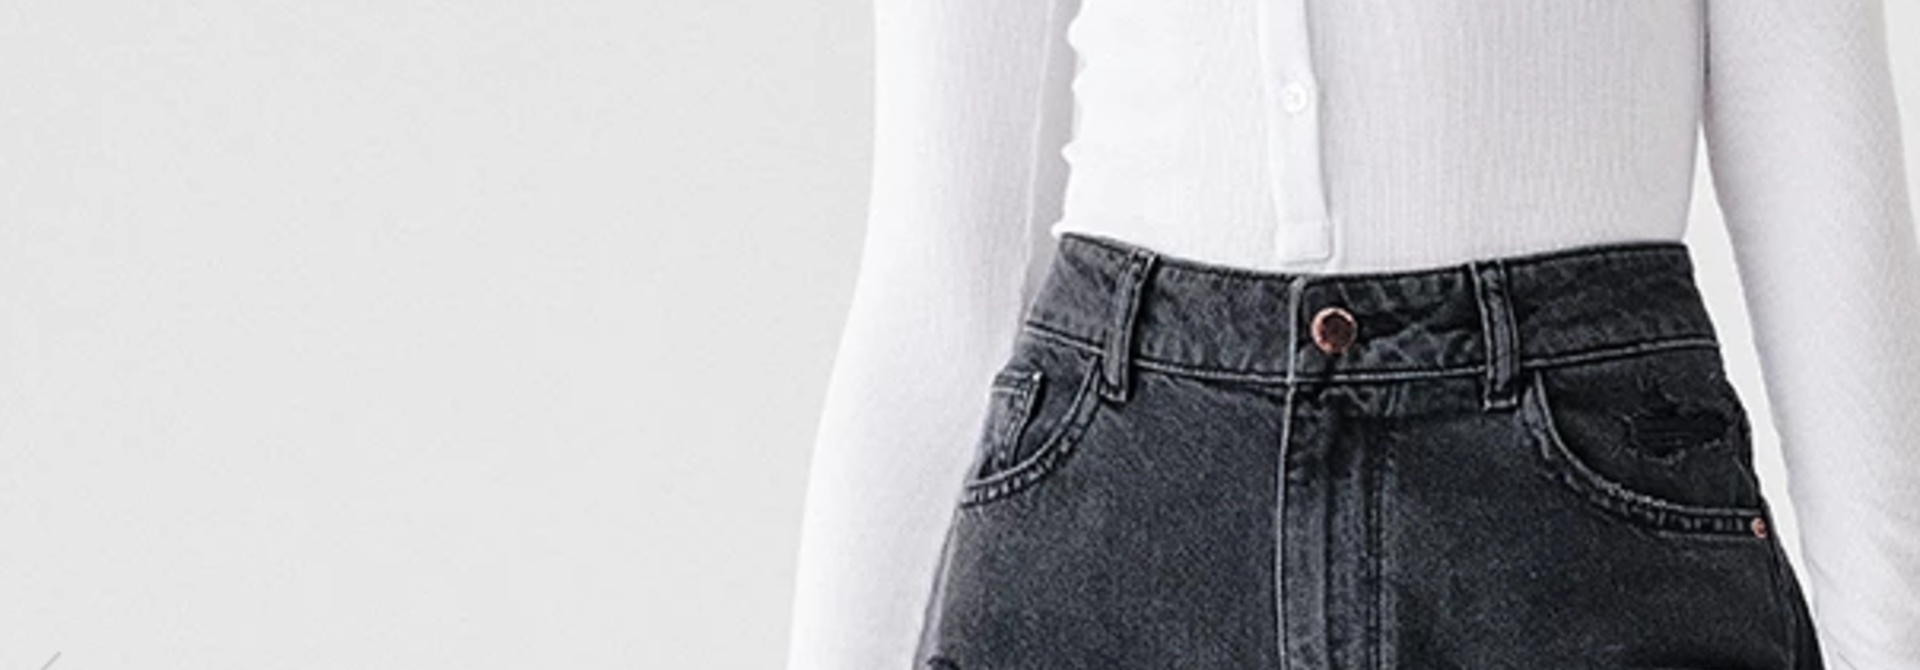 jeans DL 1961 JERRY SALINAS